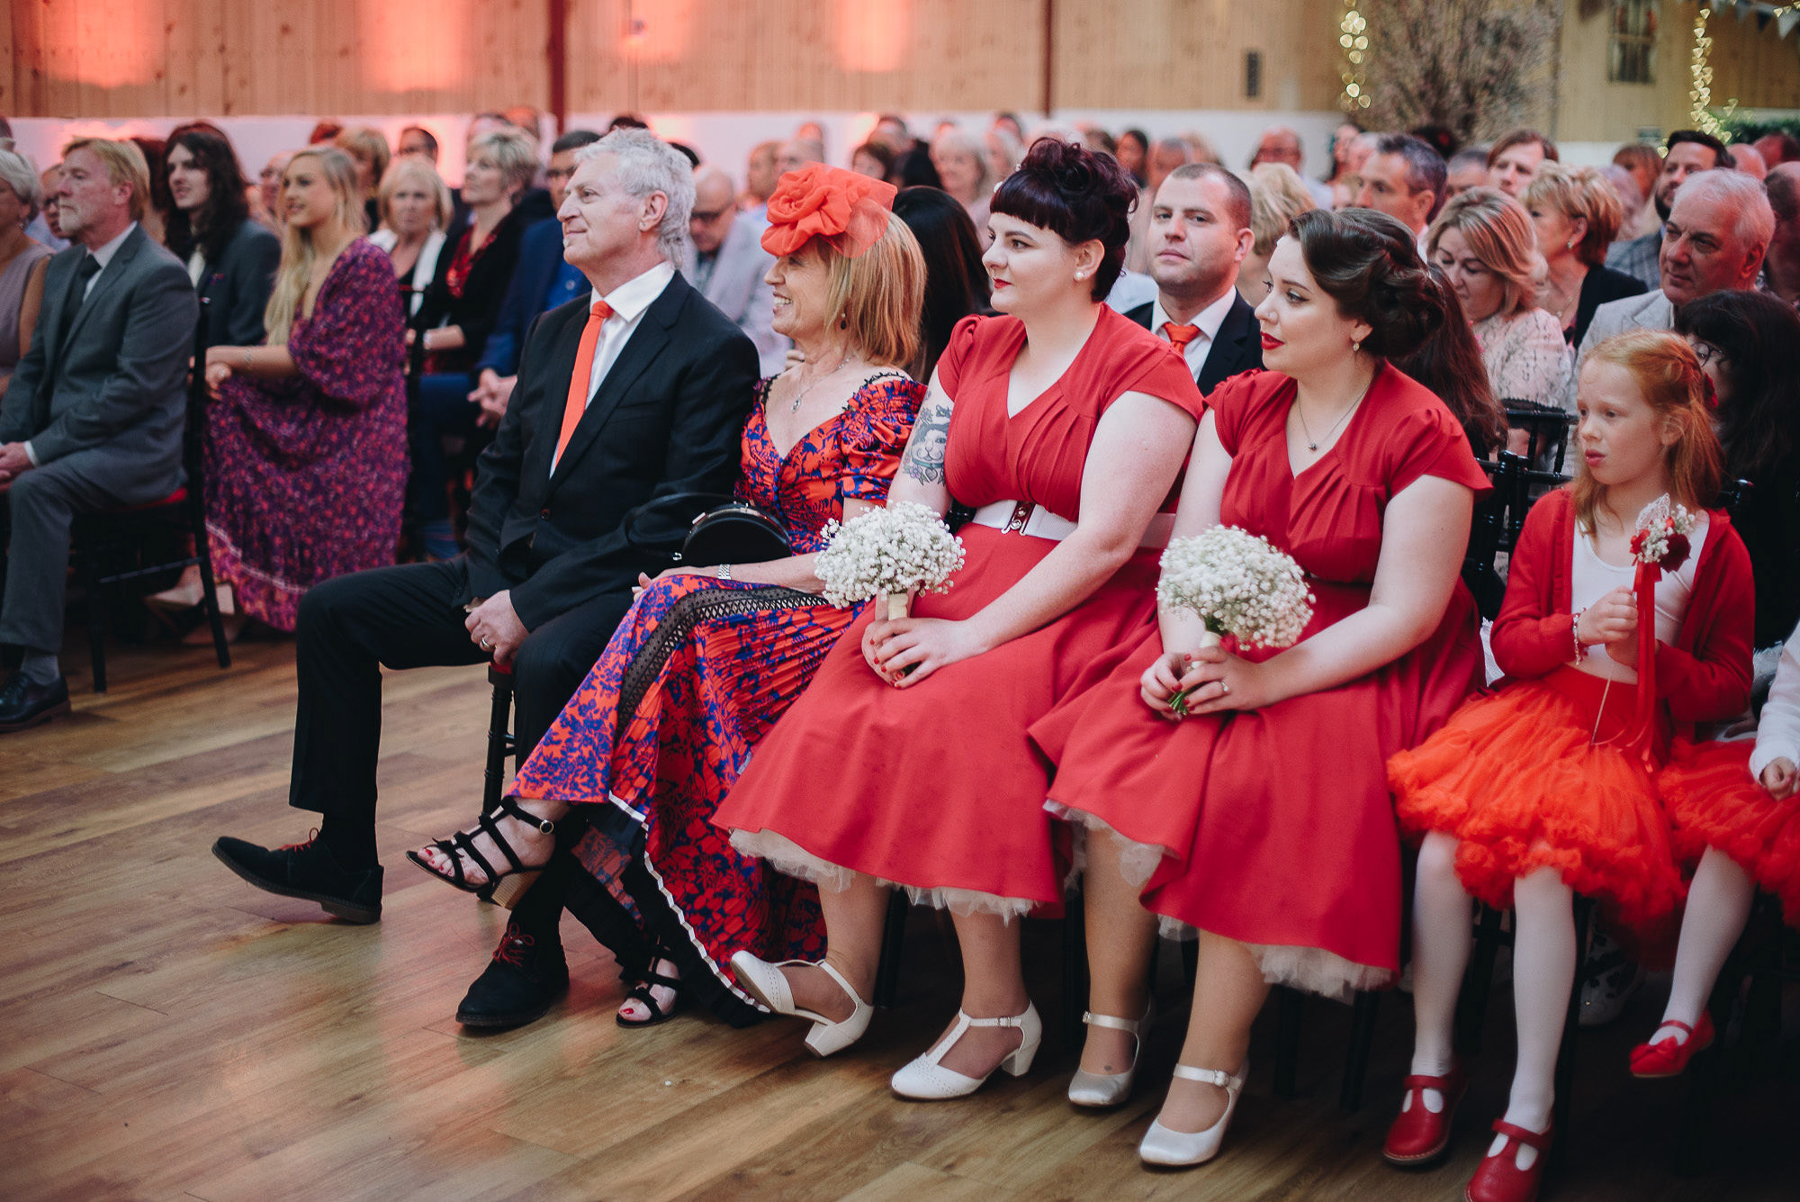 Wellbeing_Farm_Wedding_Photography_The_Pin-Up_Bride_Lara_Shaun-55.jpg